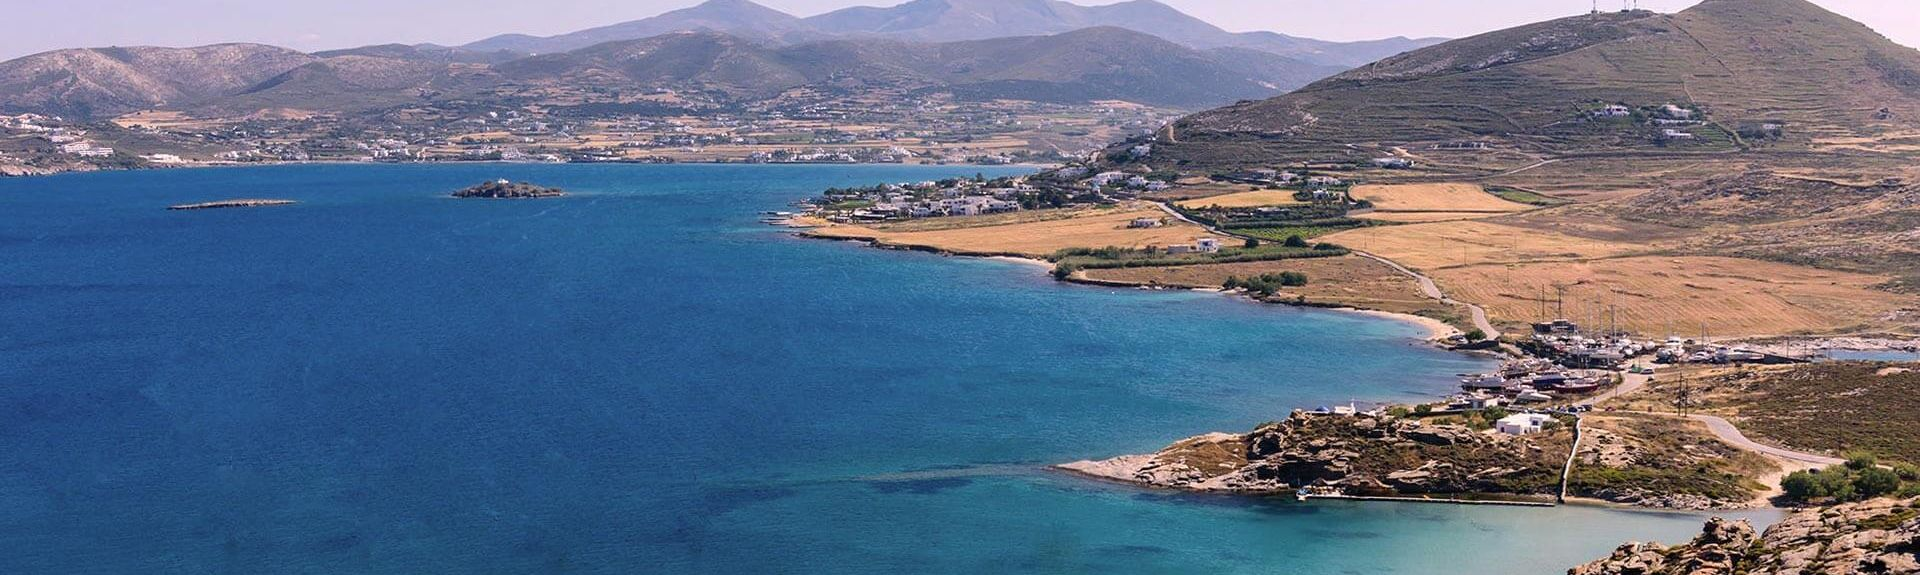 Naousa Havn, Naousa, De Ægæiske Øer, Grækenland